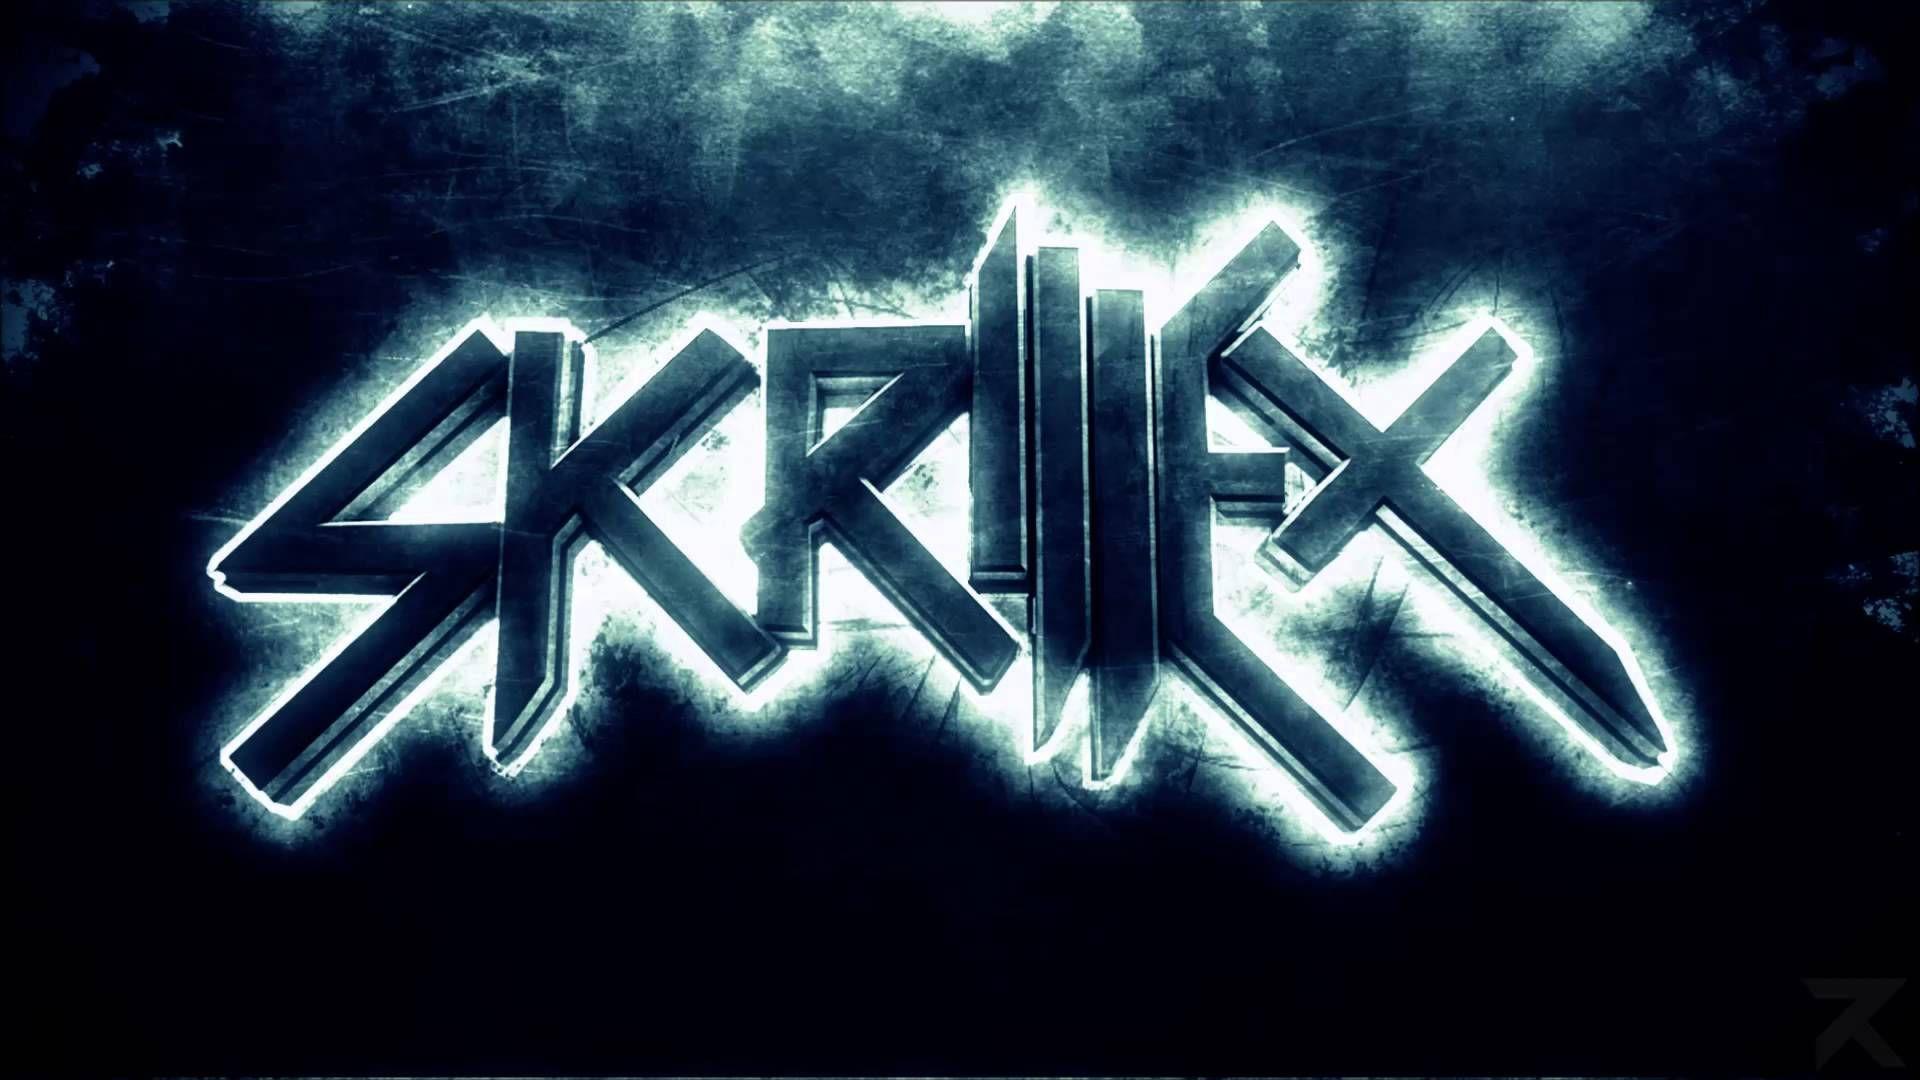 Skrillex Recess Wallpaper Picture